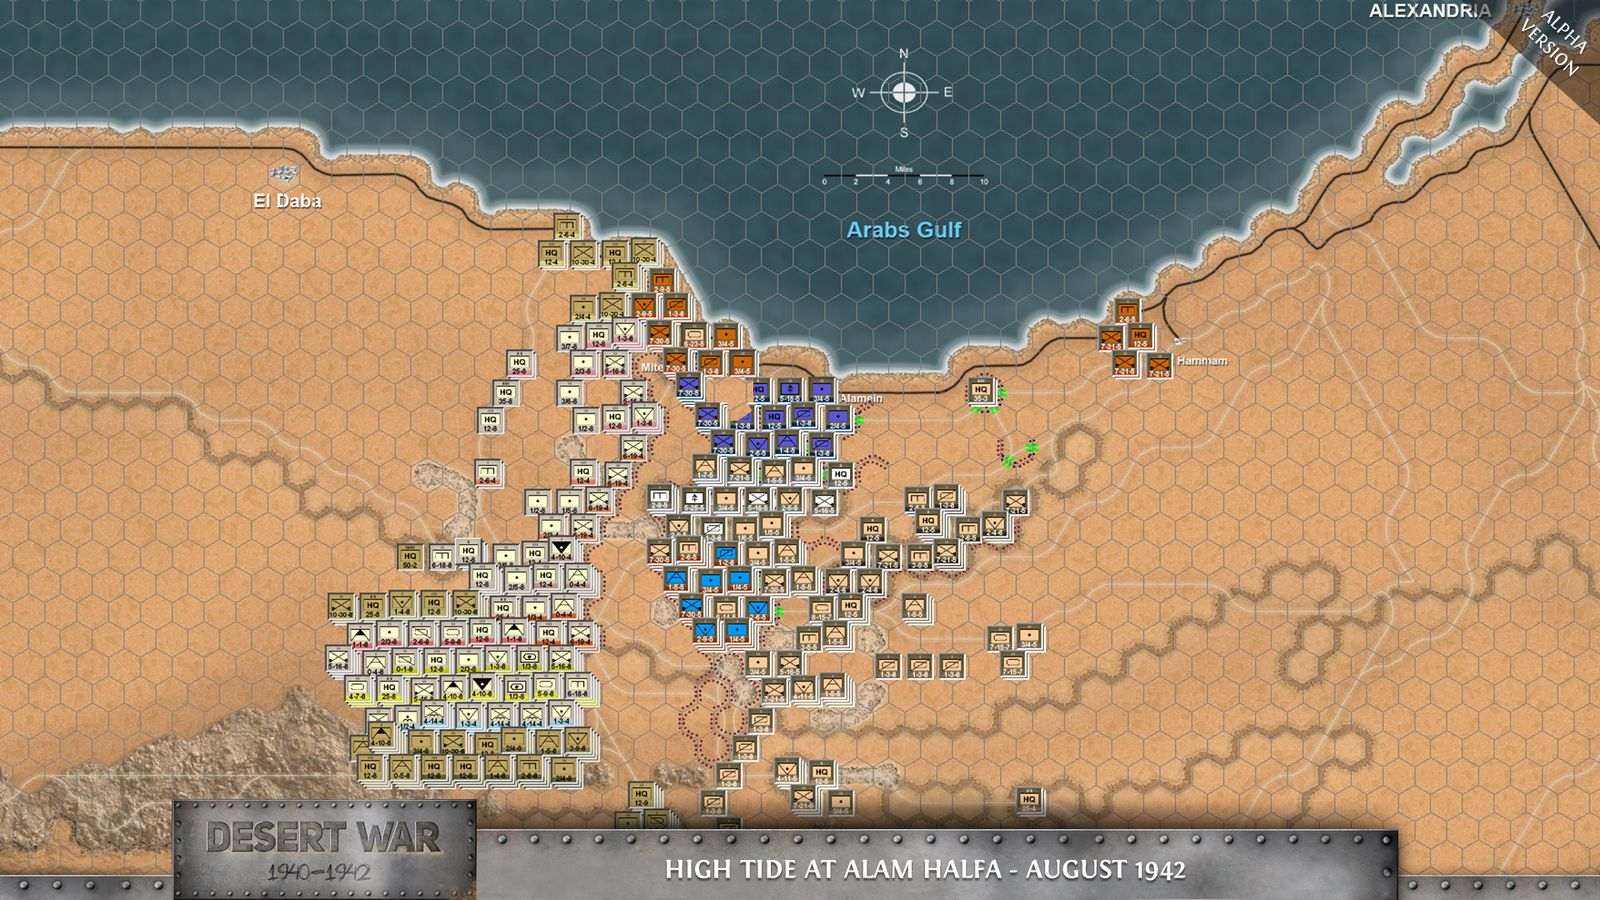 desert-war-40-42-0717-11_High_Tide_at_Alam_Halfa_Aug_1942